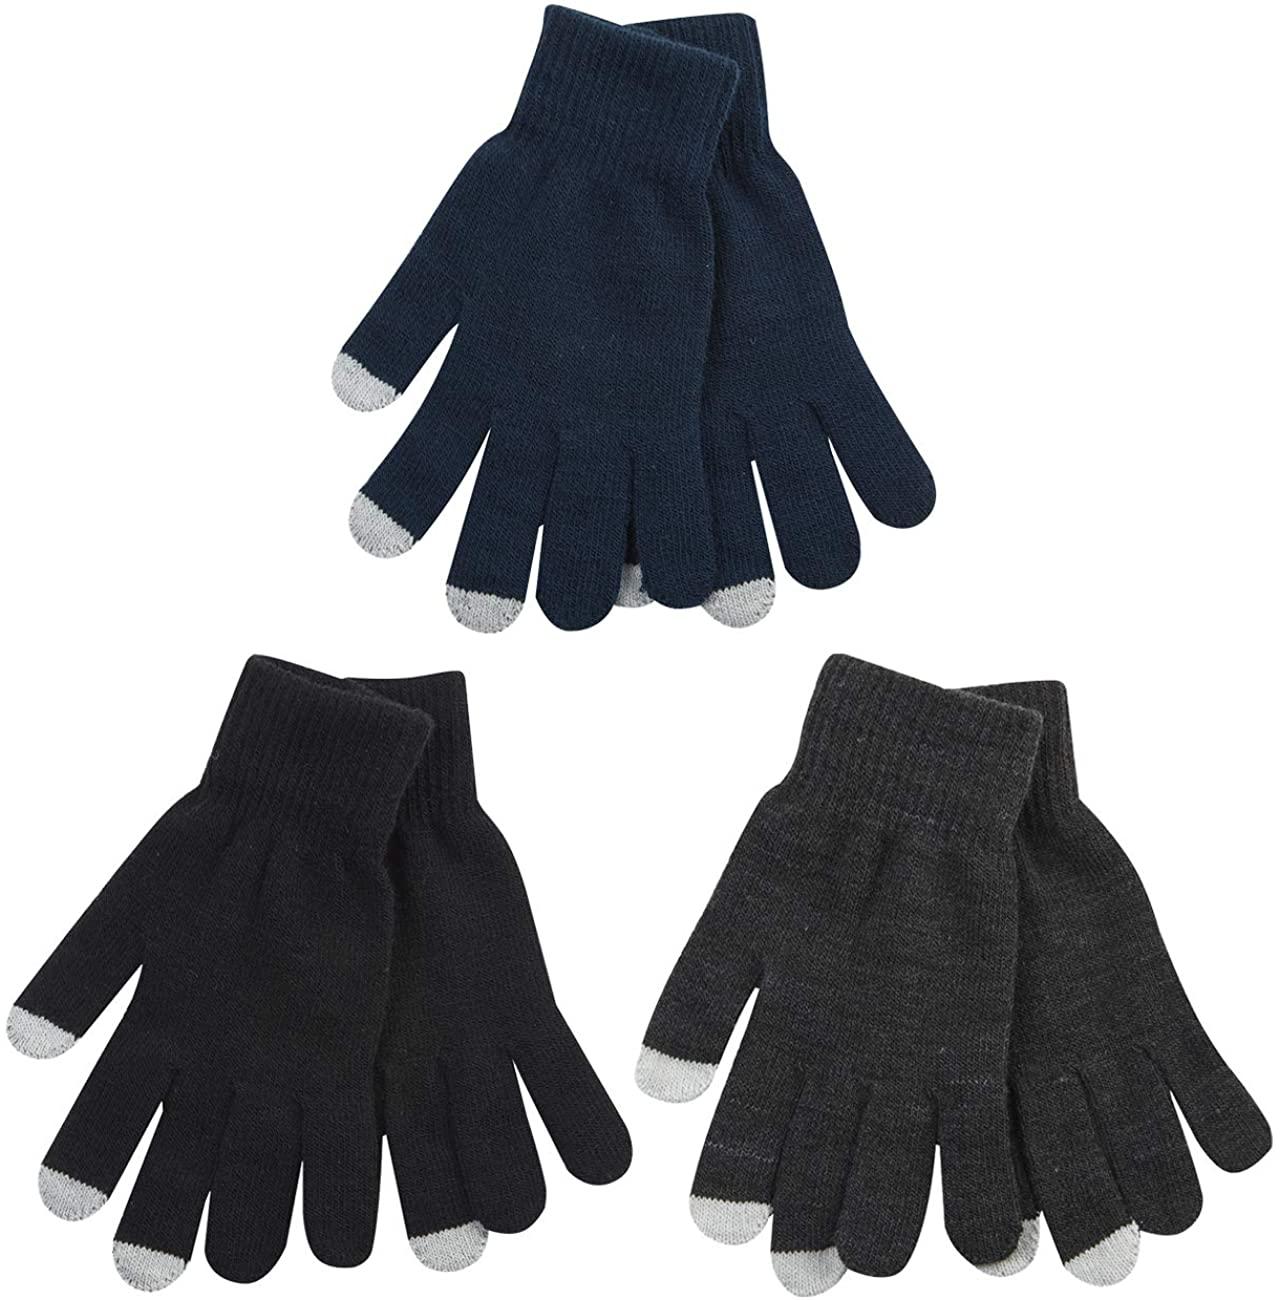 Metzuyan Mens Touch Screen Texting Gloves Winter Warm Knit